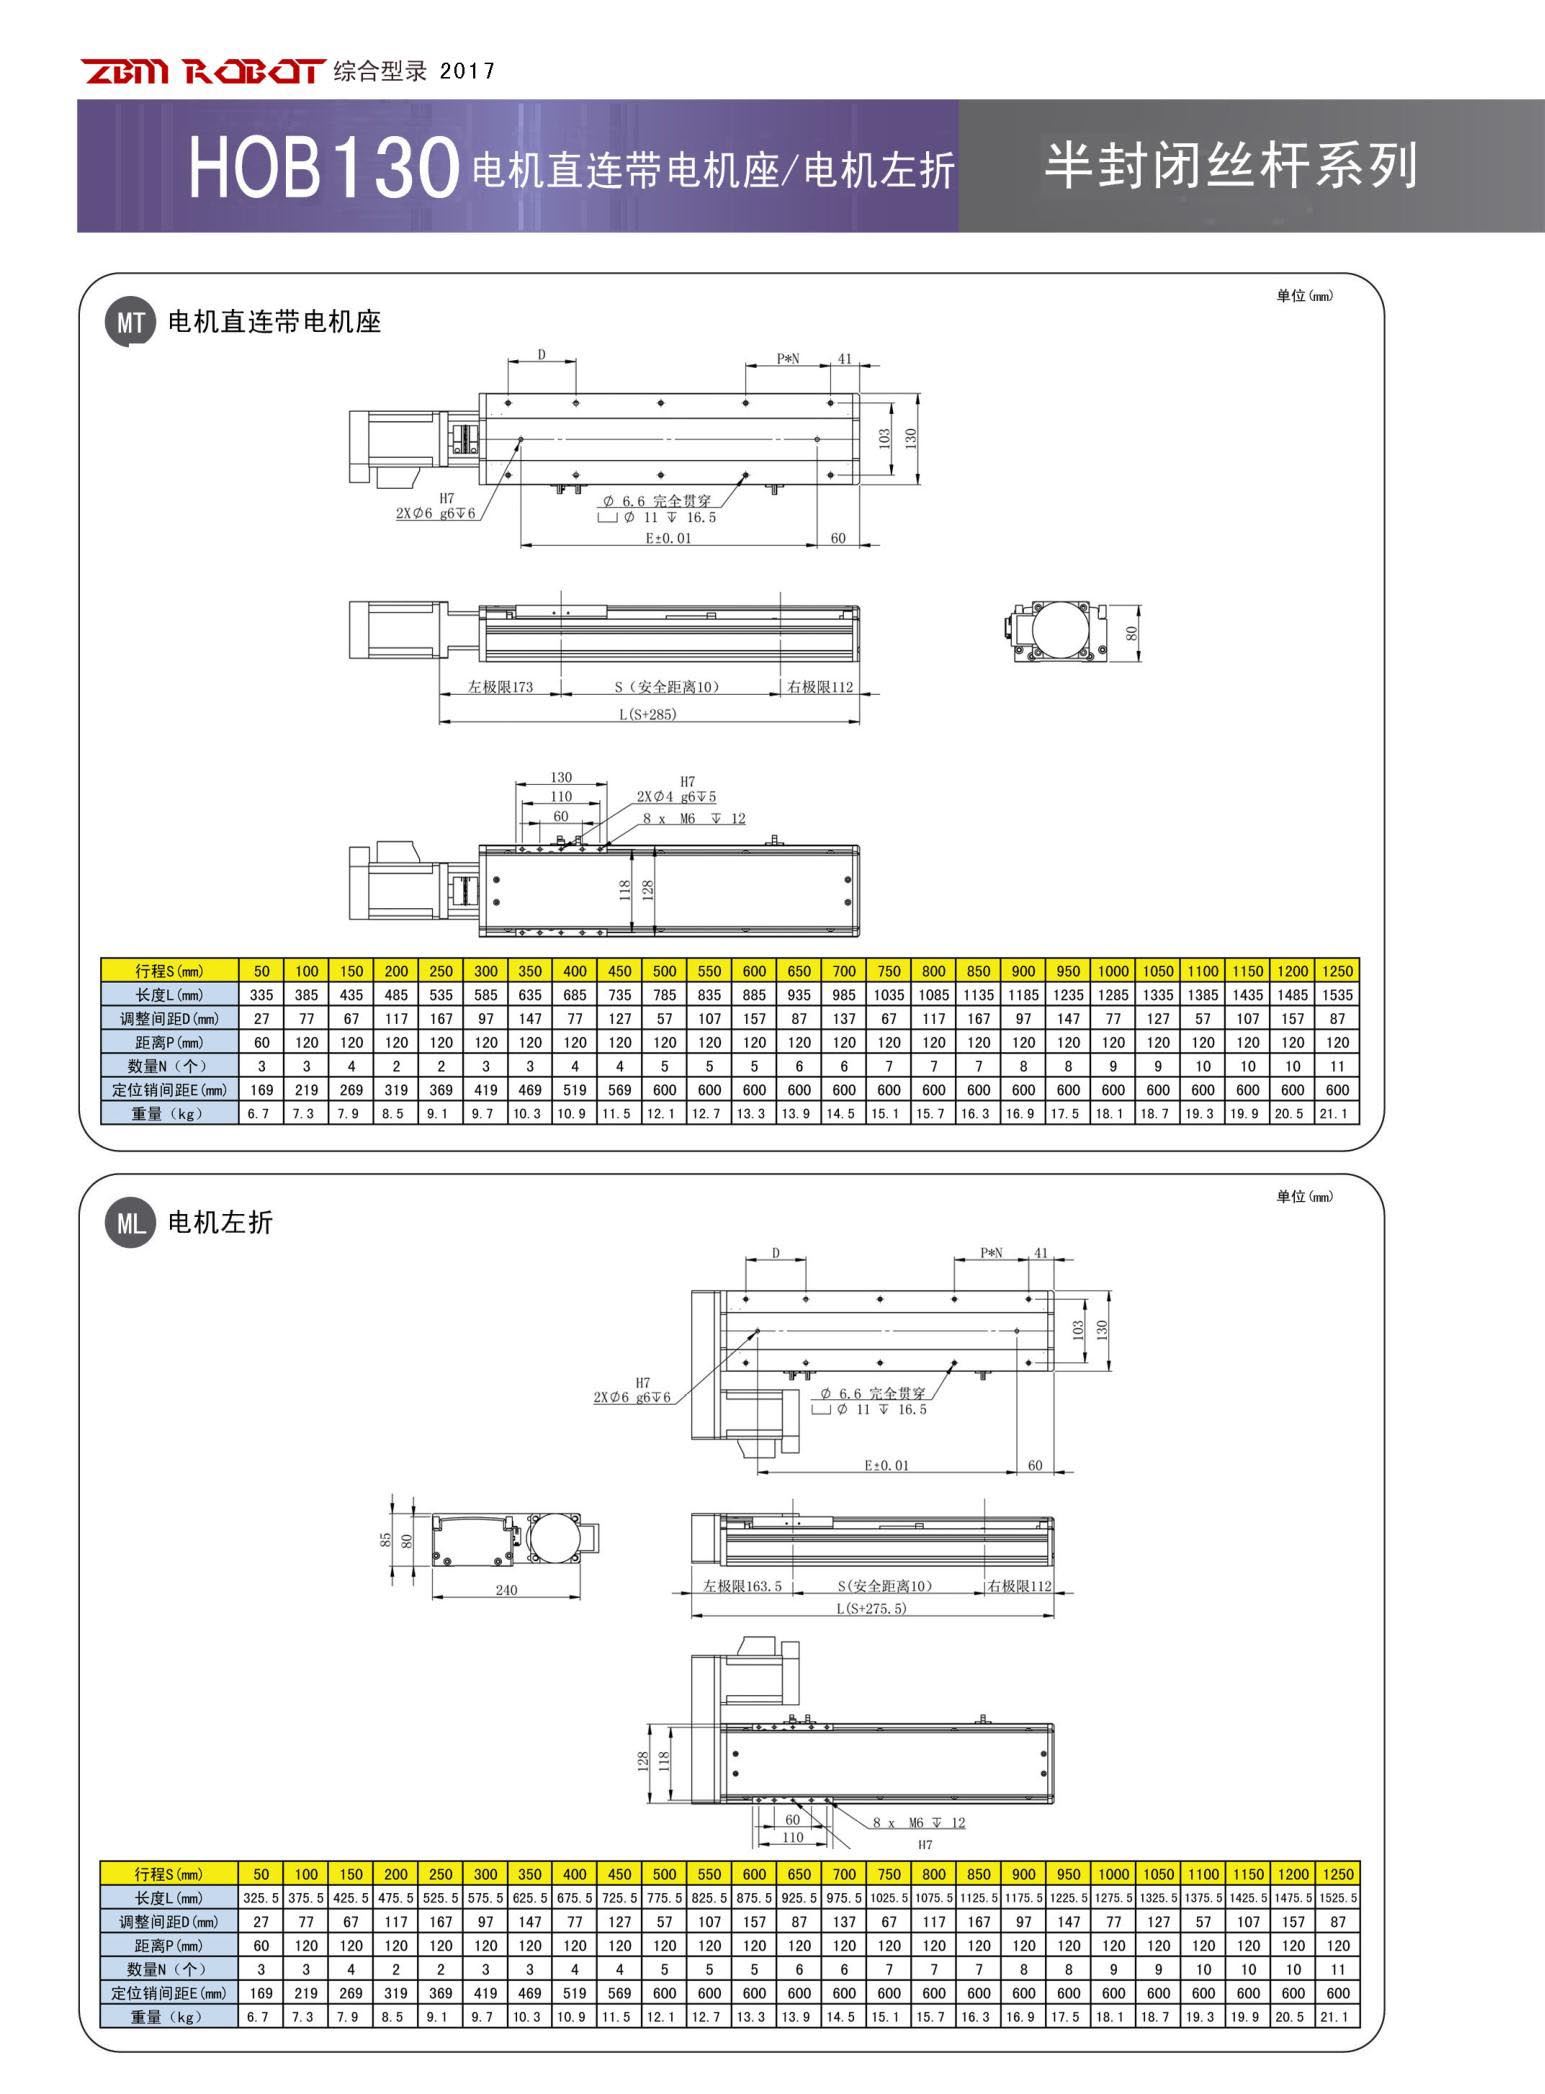 HOB130S-CM|半封闭丝杆模组-宝马娱乐在线1211app